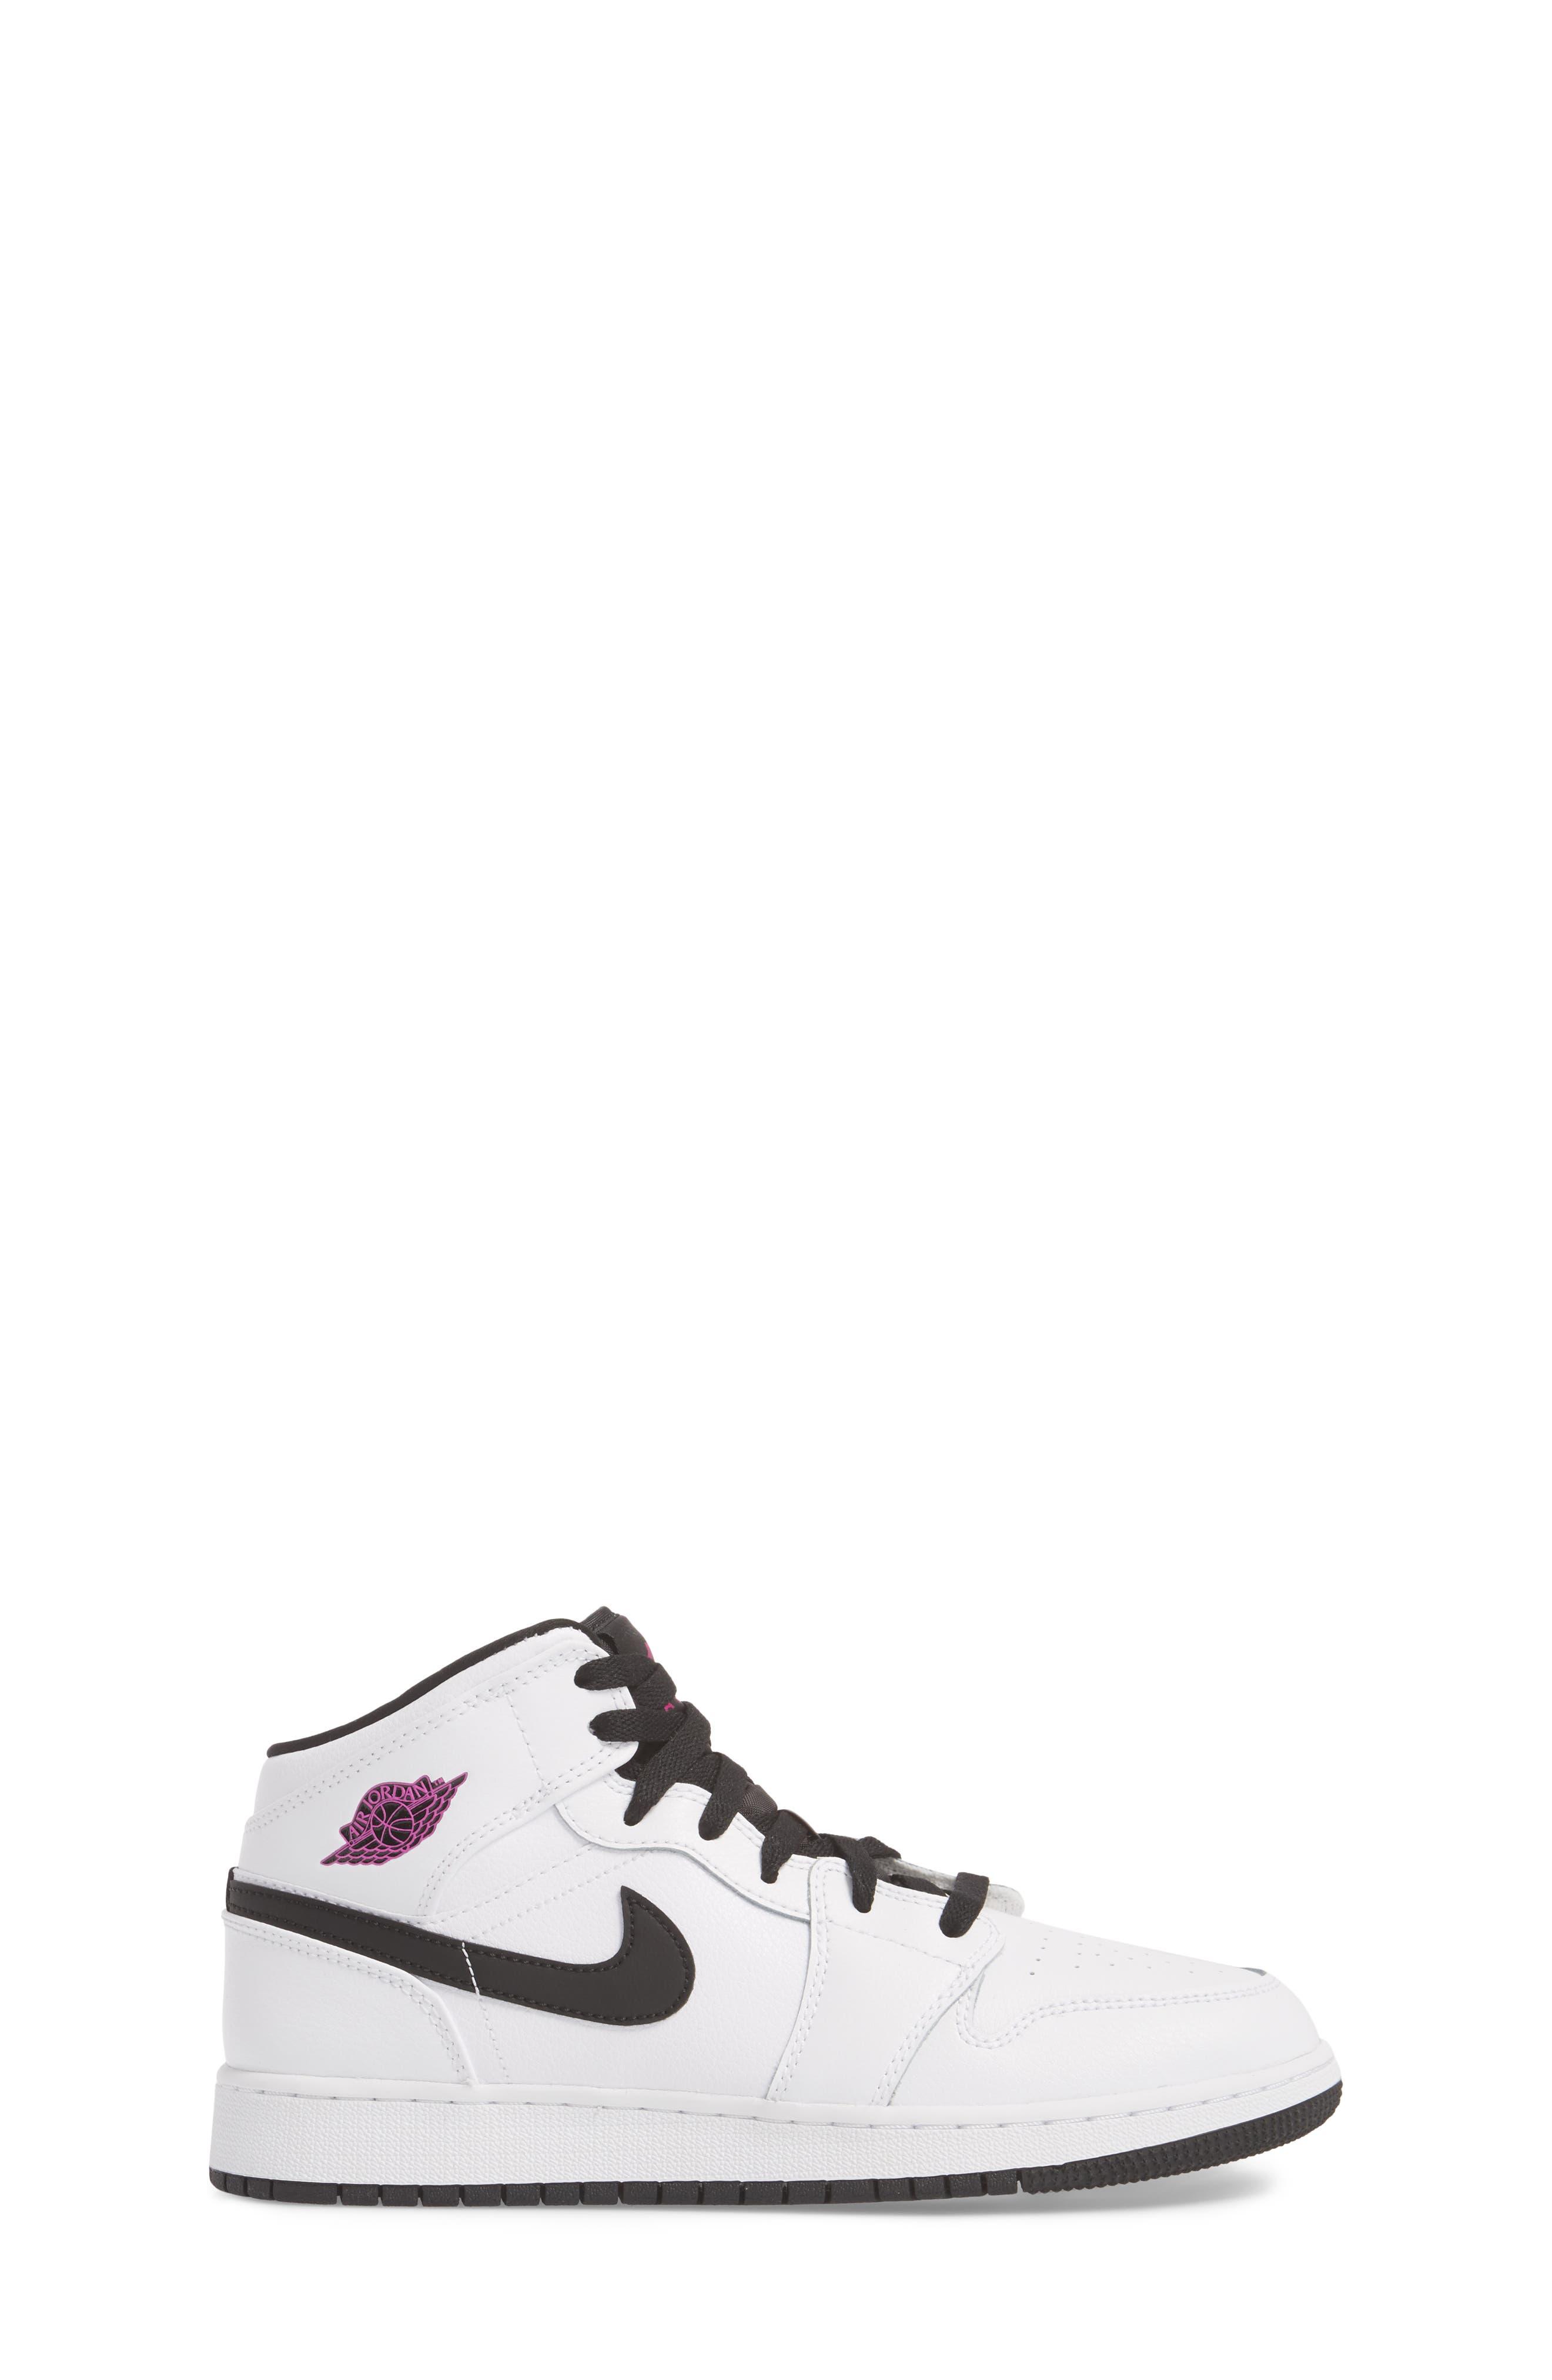 Nike 'Air Jordan 1 Mid' Sneaker,                             Alternate thumbnail 3, color,                             White/ Fuchsia Blast/ Black